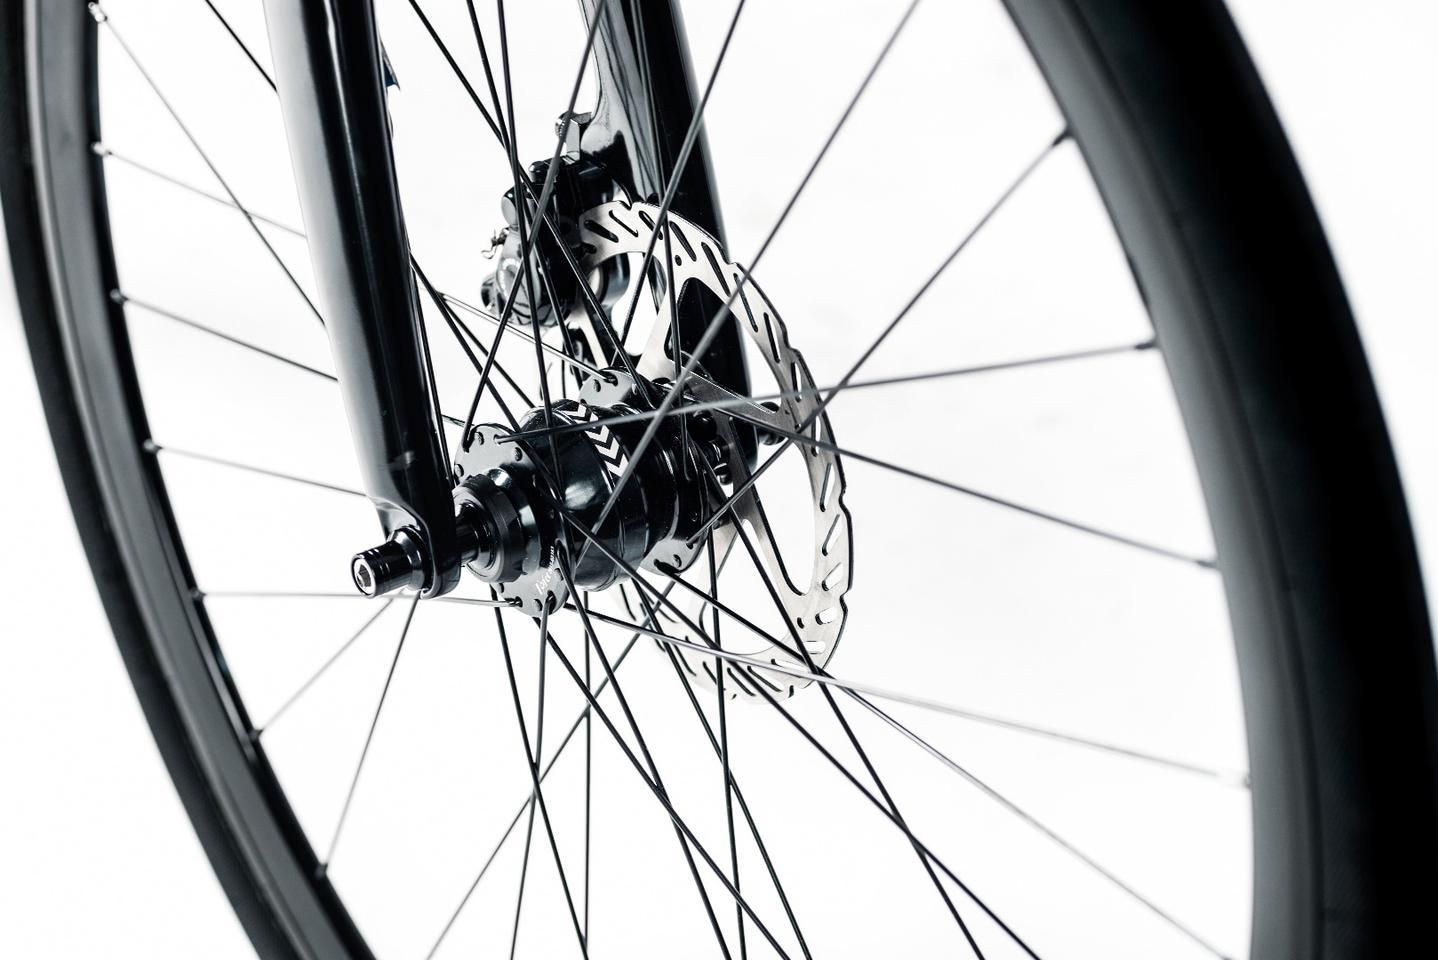 The Stadtfuchs featureshydraulic disc brakes